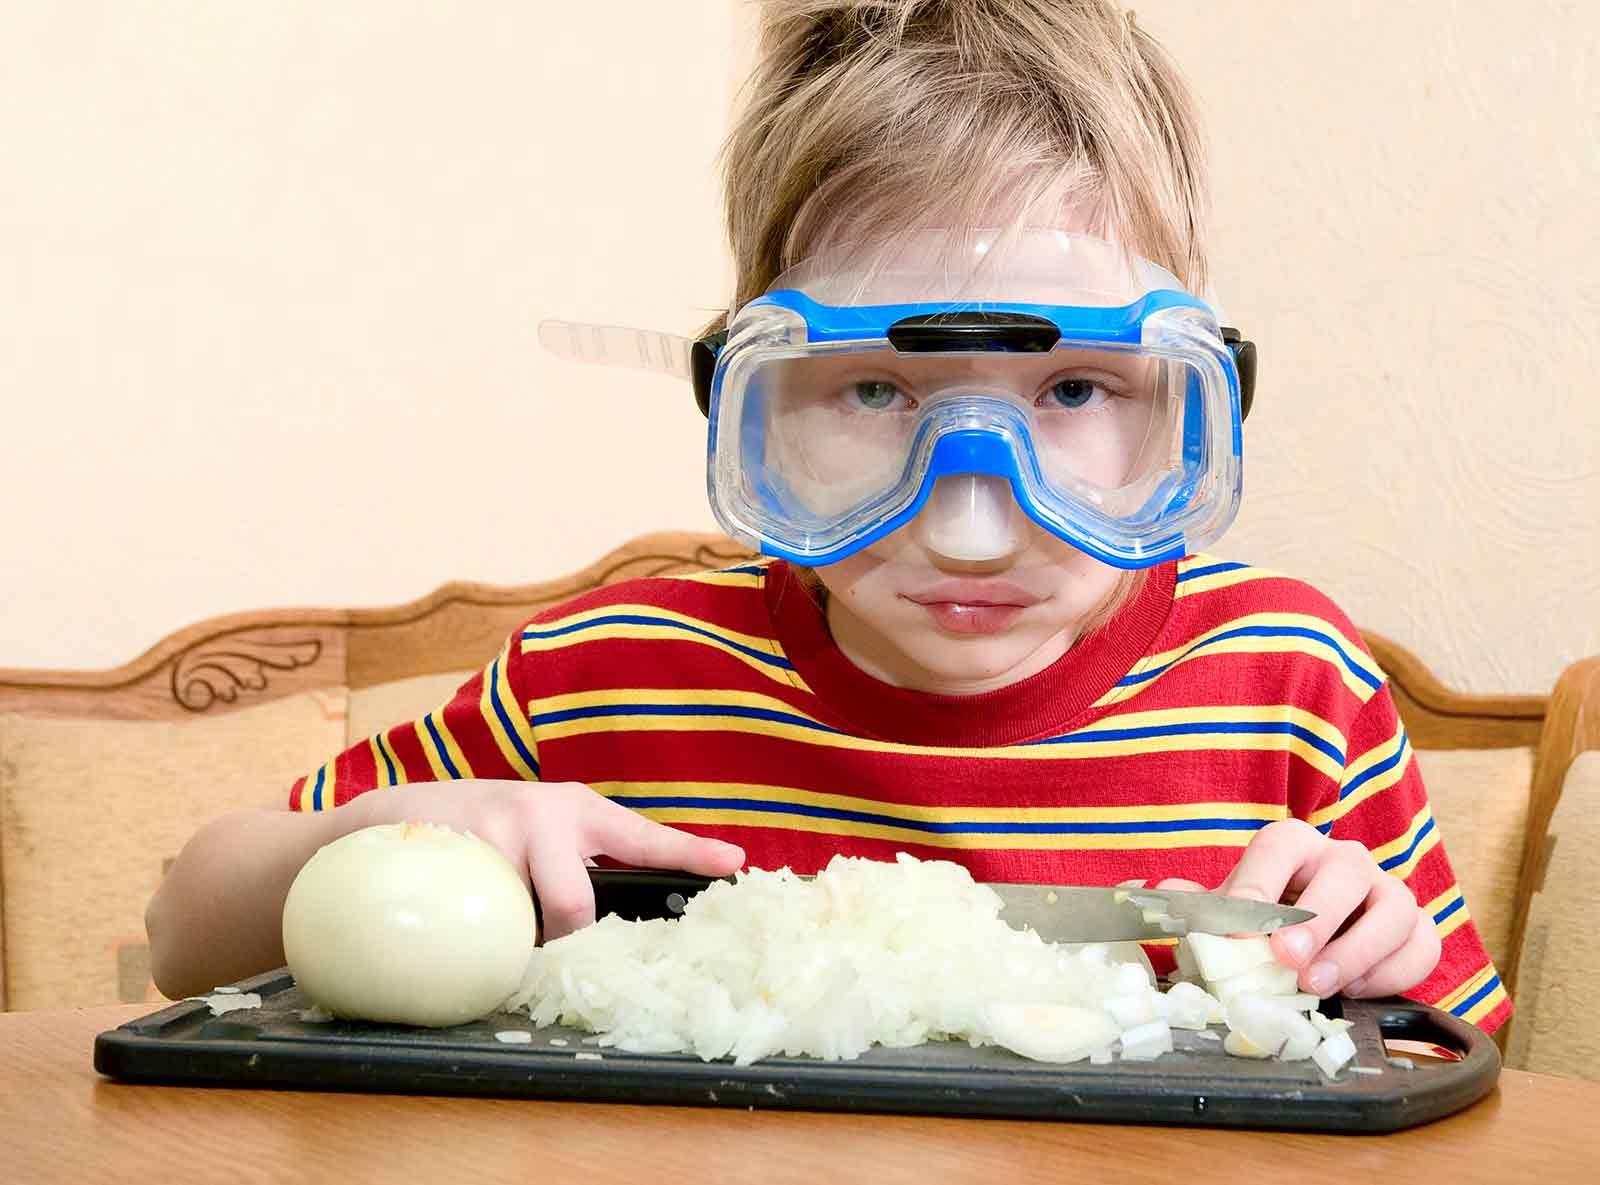 child cutting an onion wearing a snorkel mask